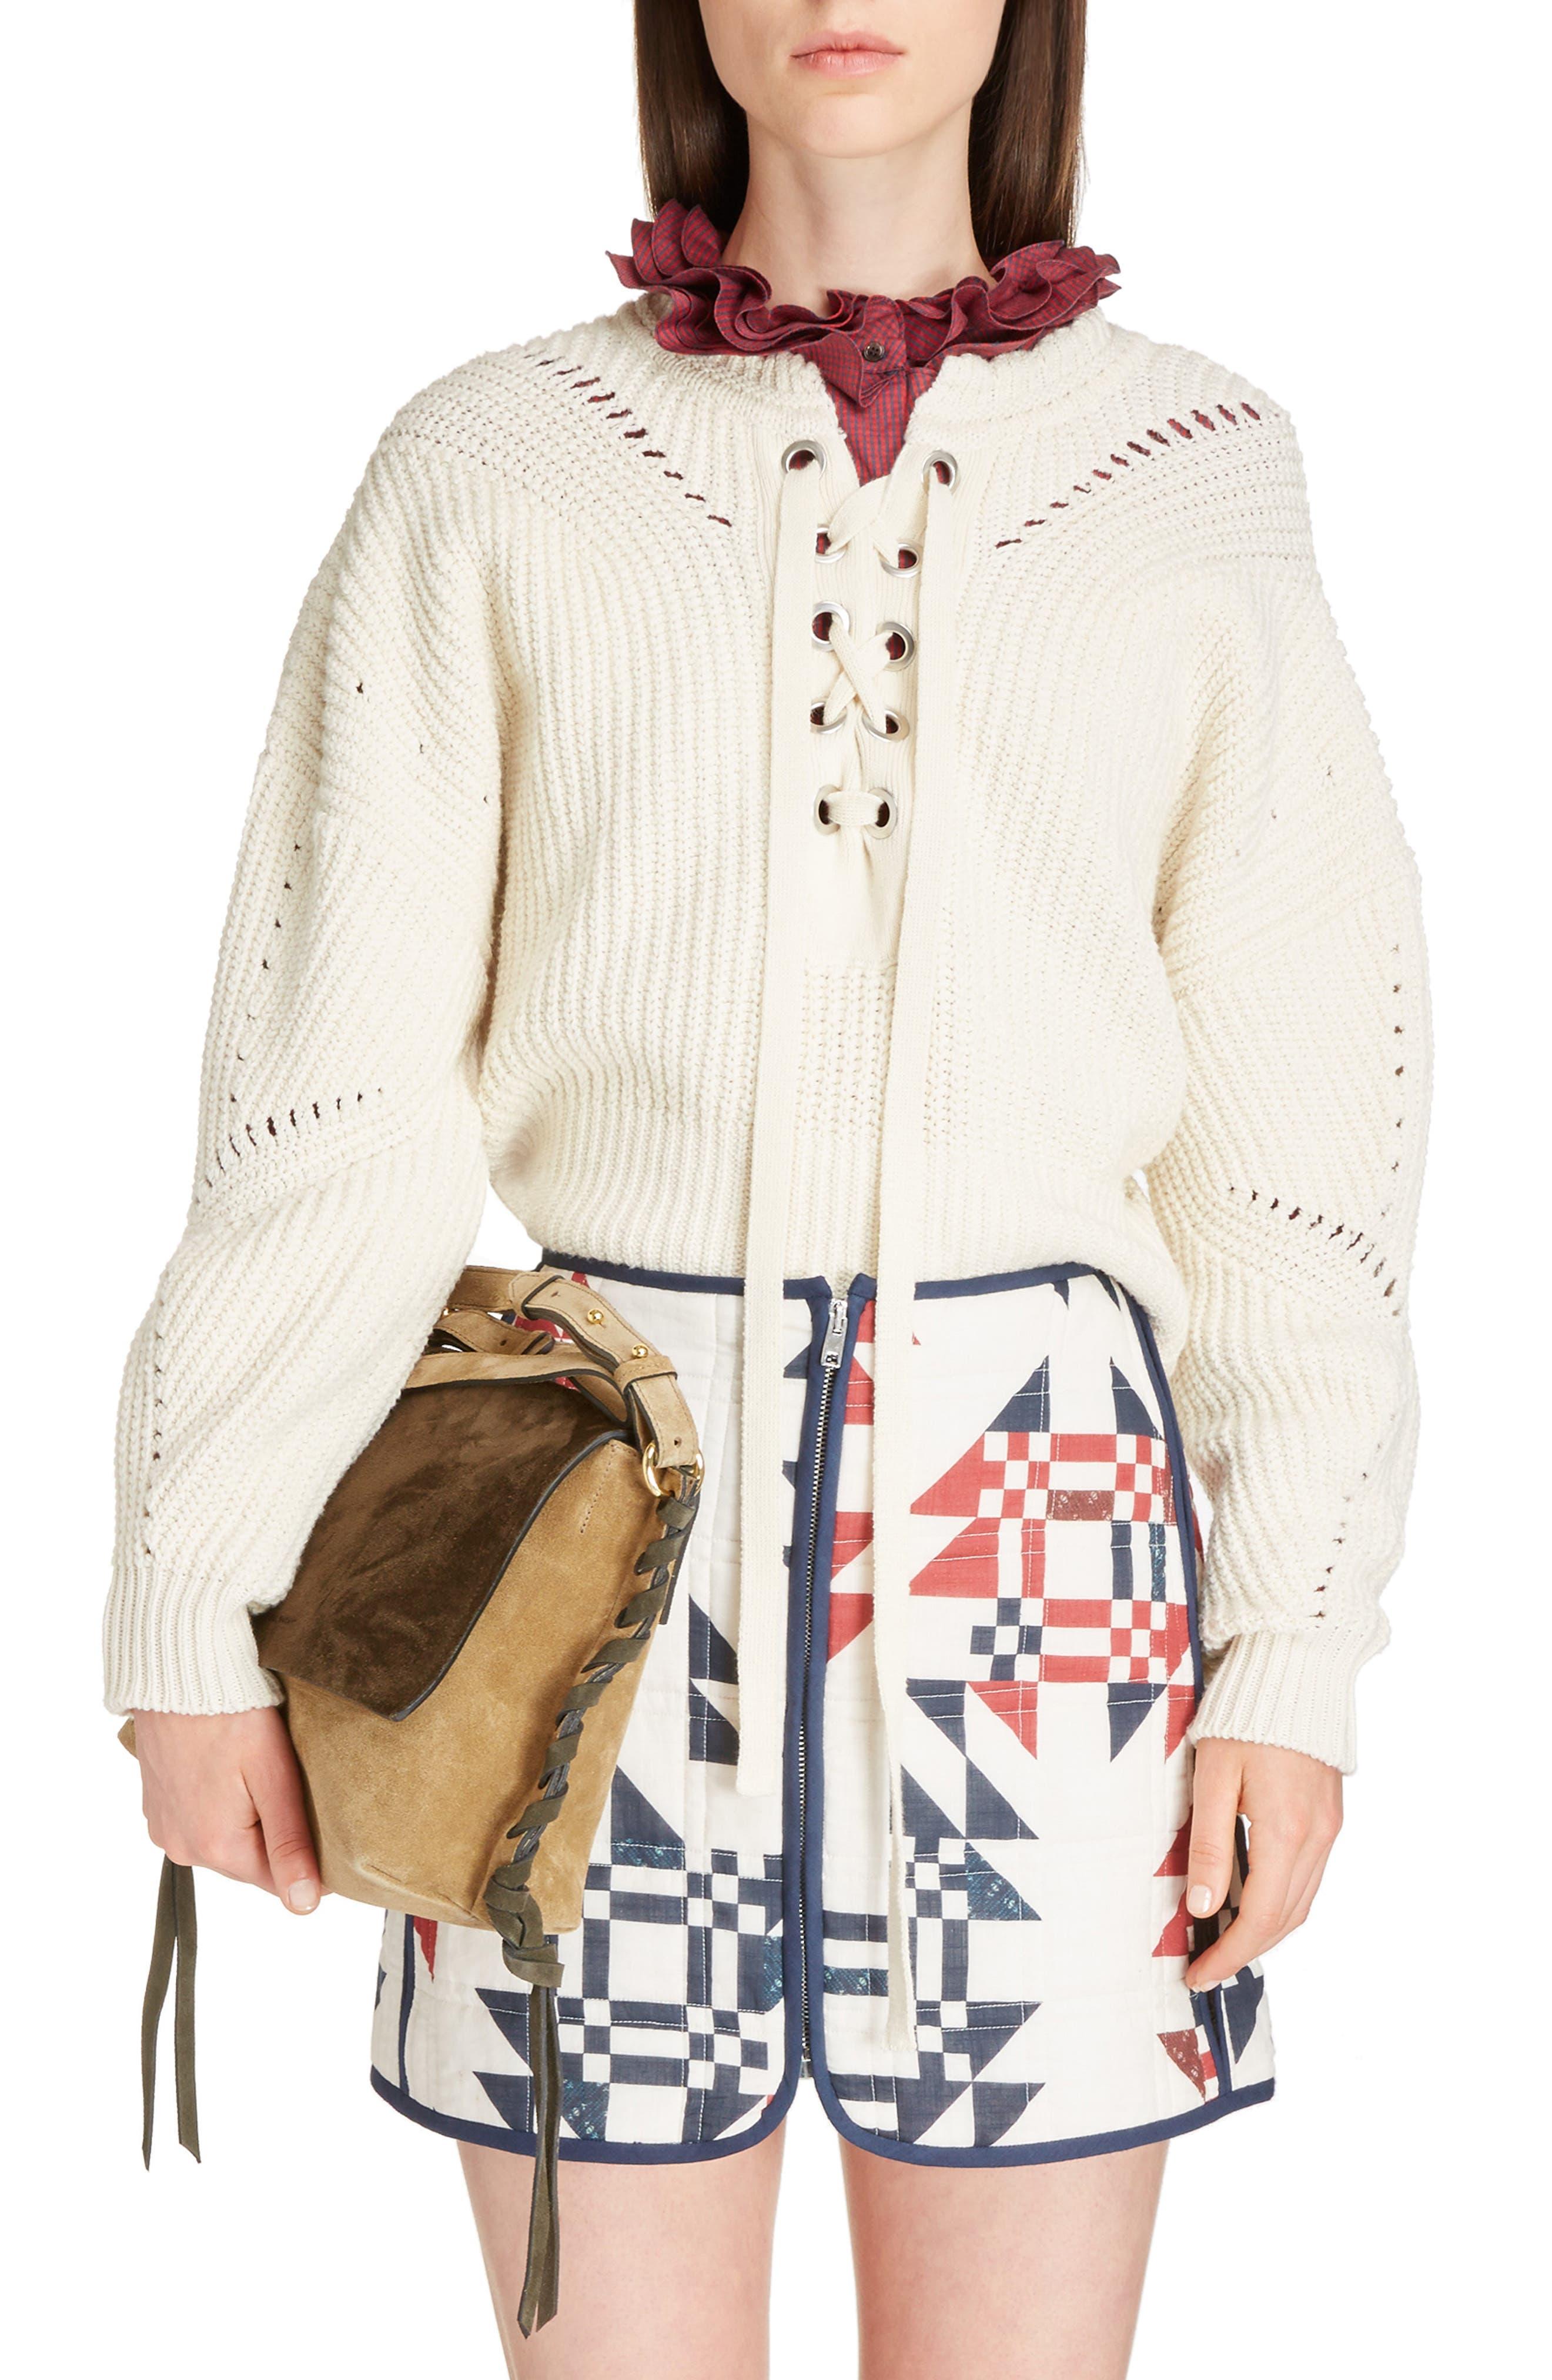 Laley Cotton & Wool Blend Sweater,                             Main thumbnail 1, color,                             Ecru